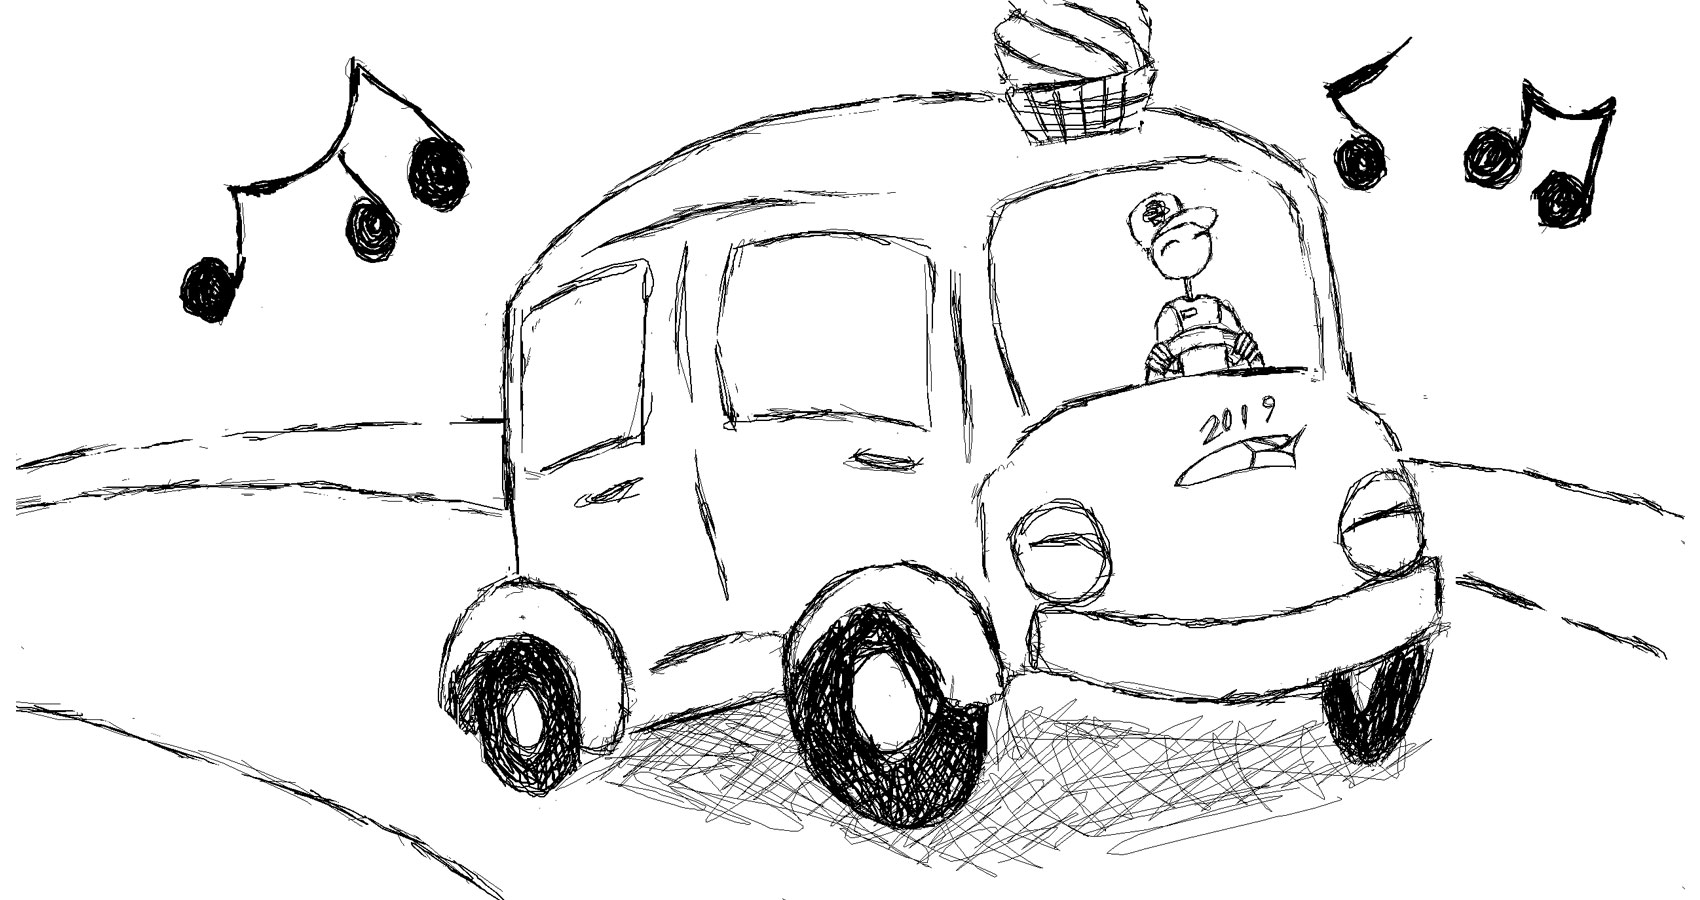 Ice Cream Trucks, a haiku by Robyn MacKinnon at Spillwords.com